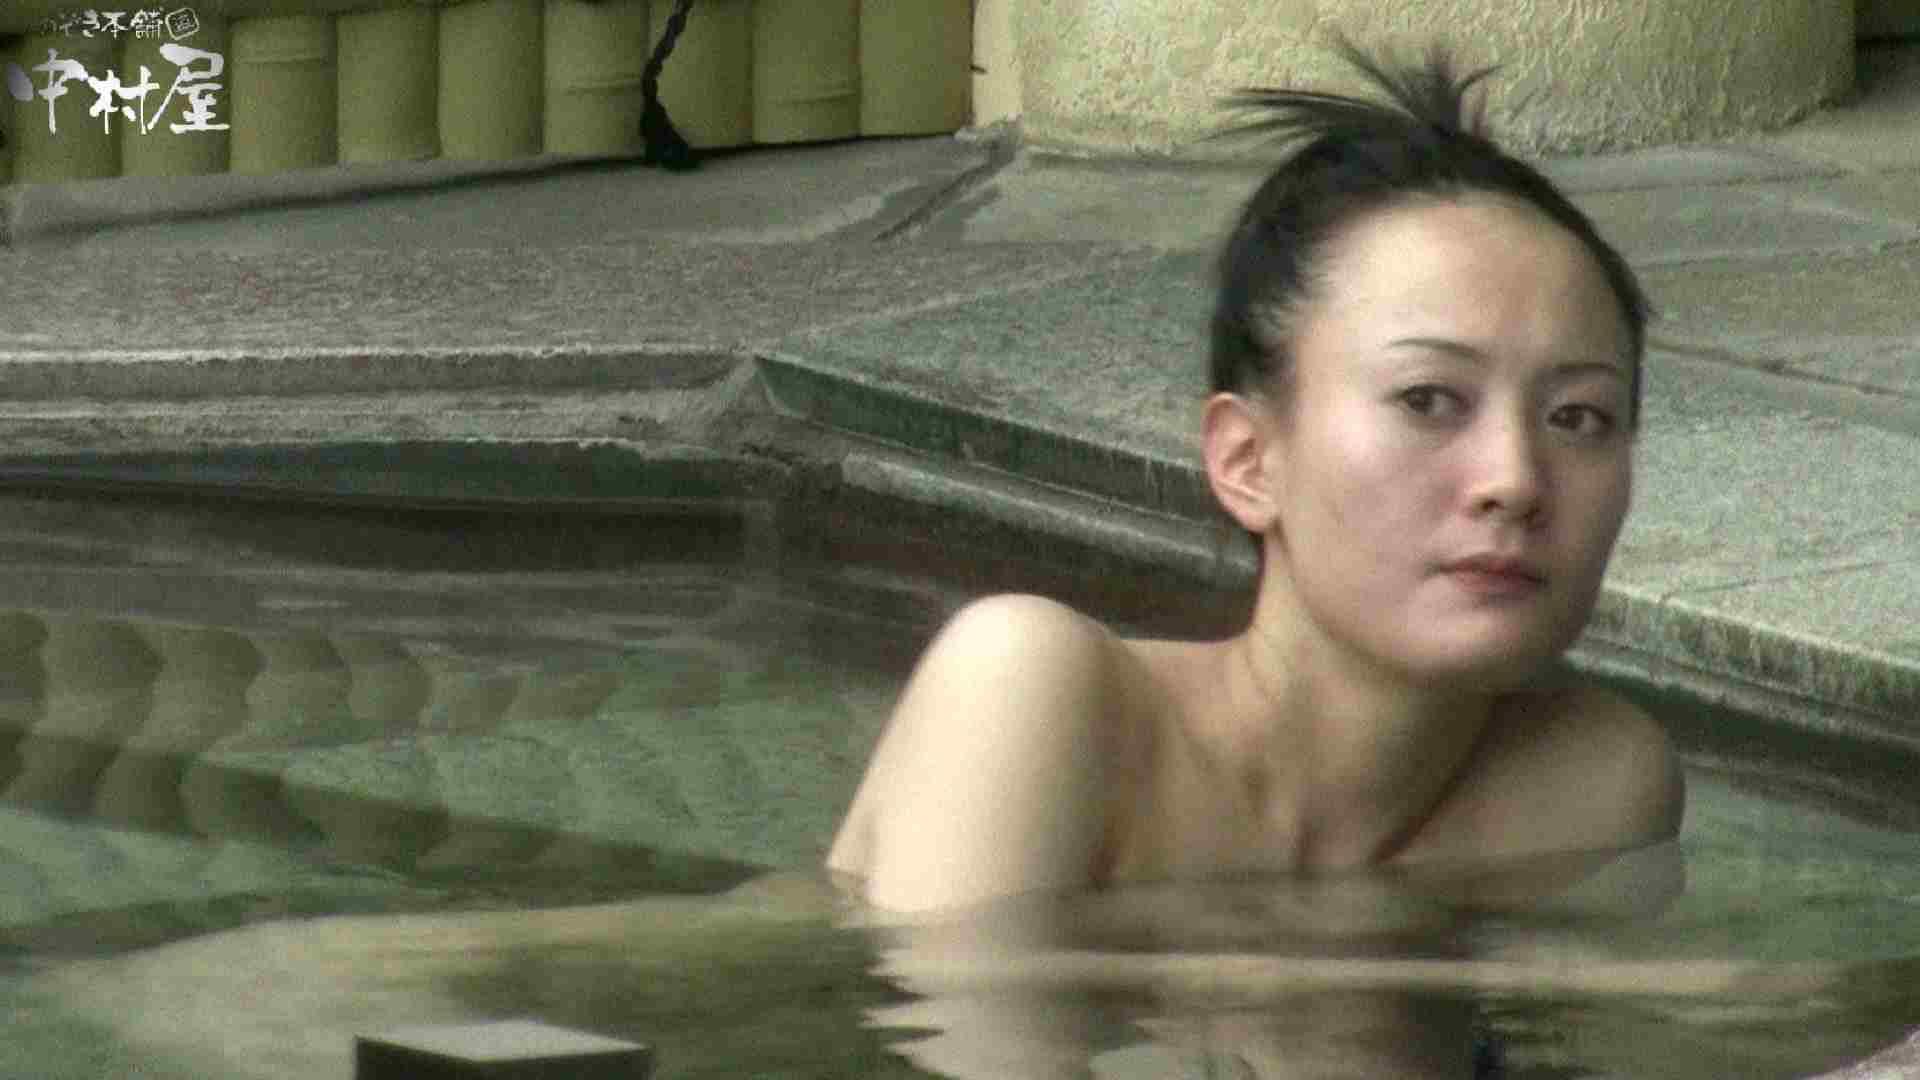 Aquaな露天風呂Vol.900 美しいOLの裸体   露天風呂突入  86pic 37